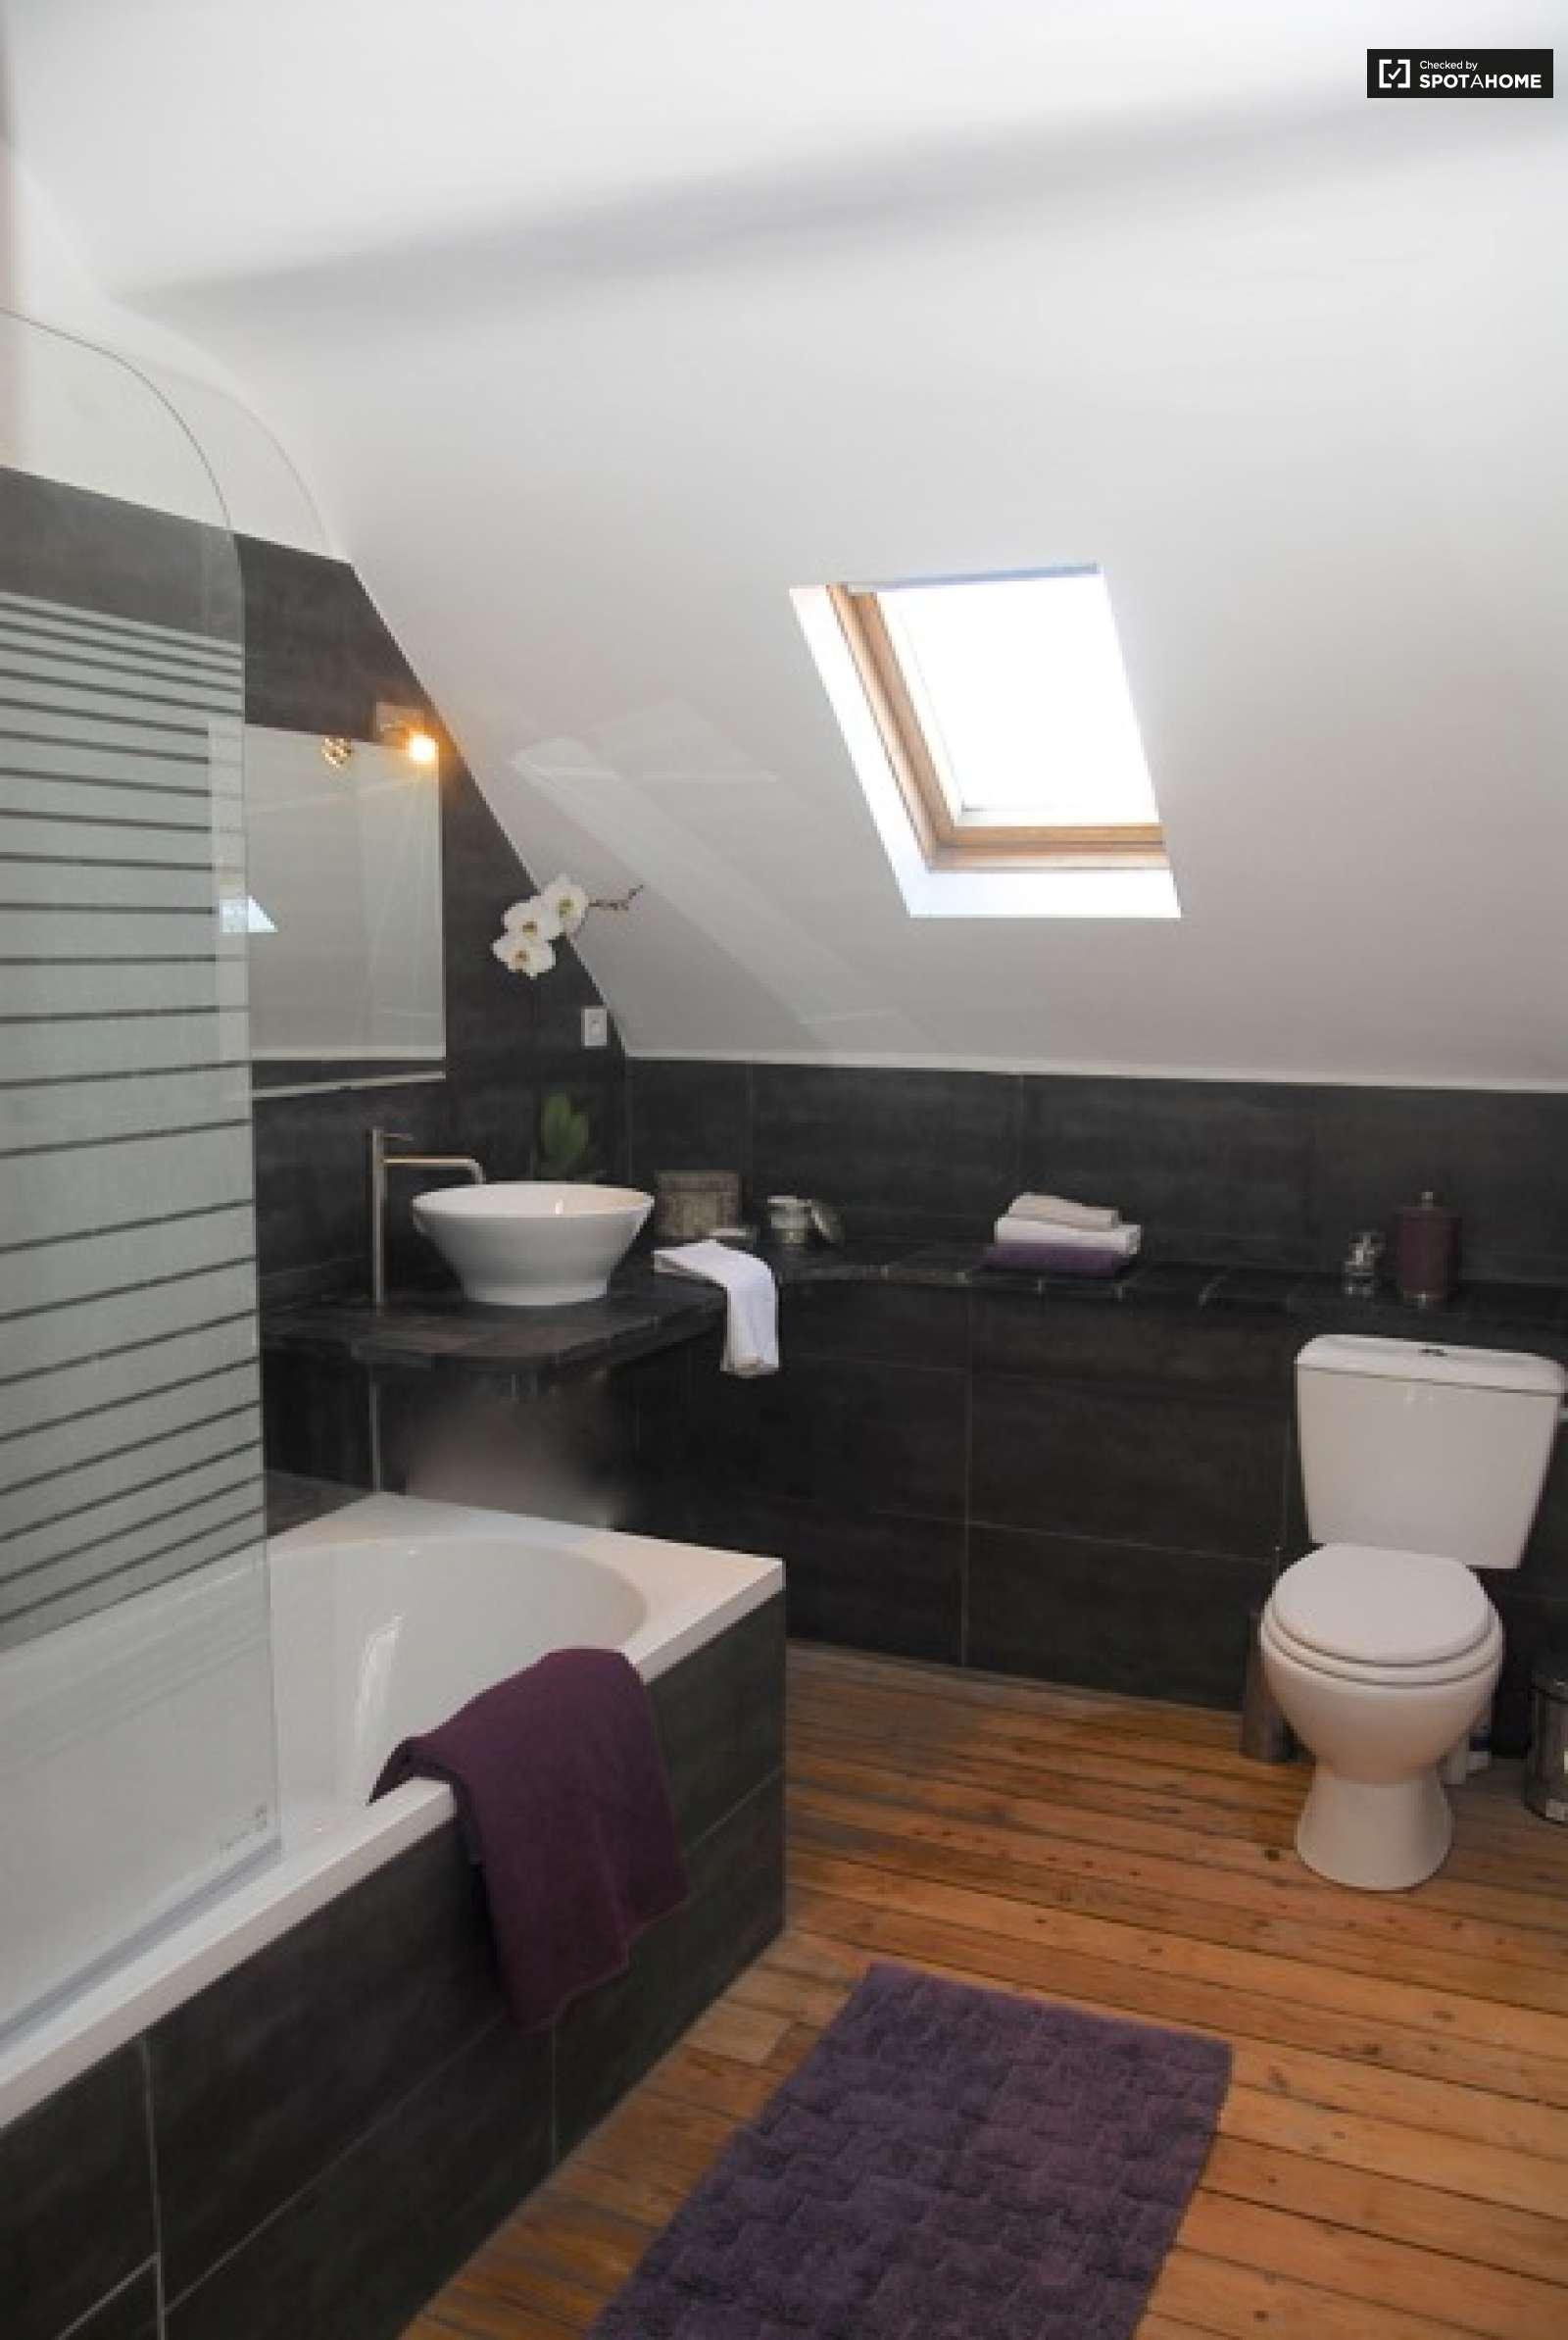 chambre quip e dans un appartement schaerbeek bruxelles ref 99217 spotahome. Black Bedroom Furniture Sets. Home Design Ideas